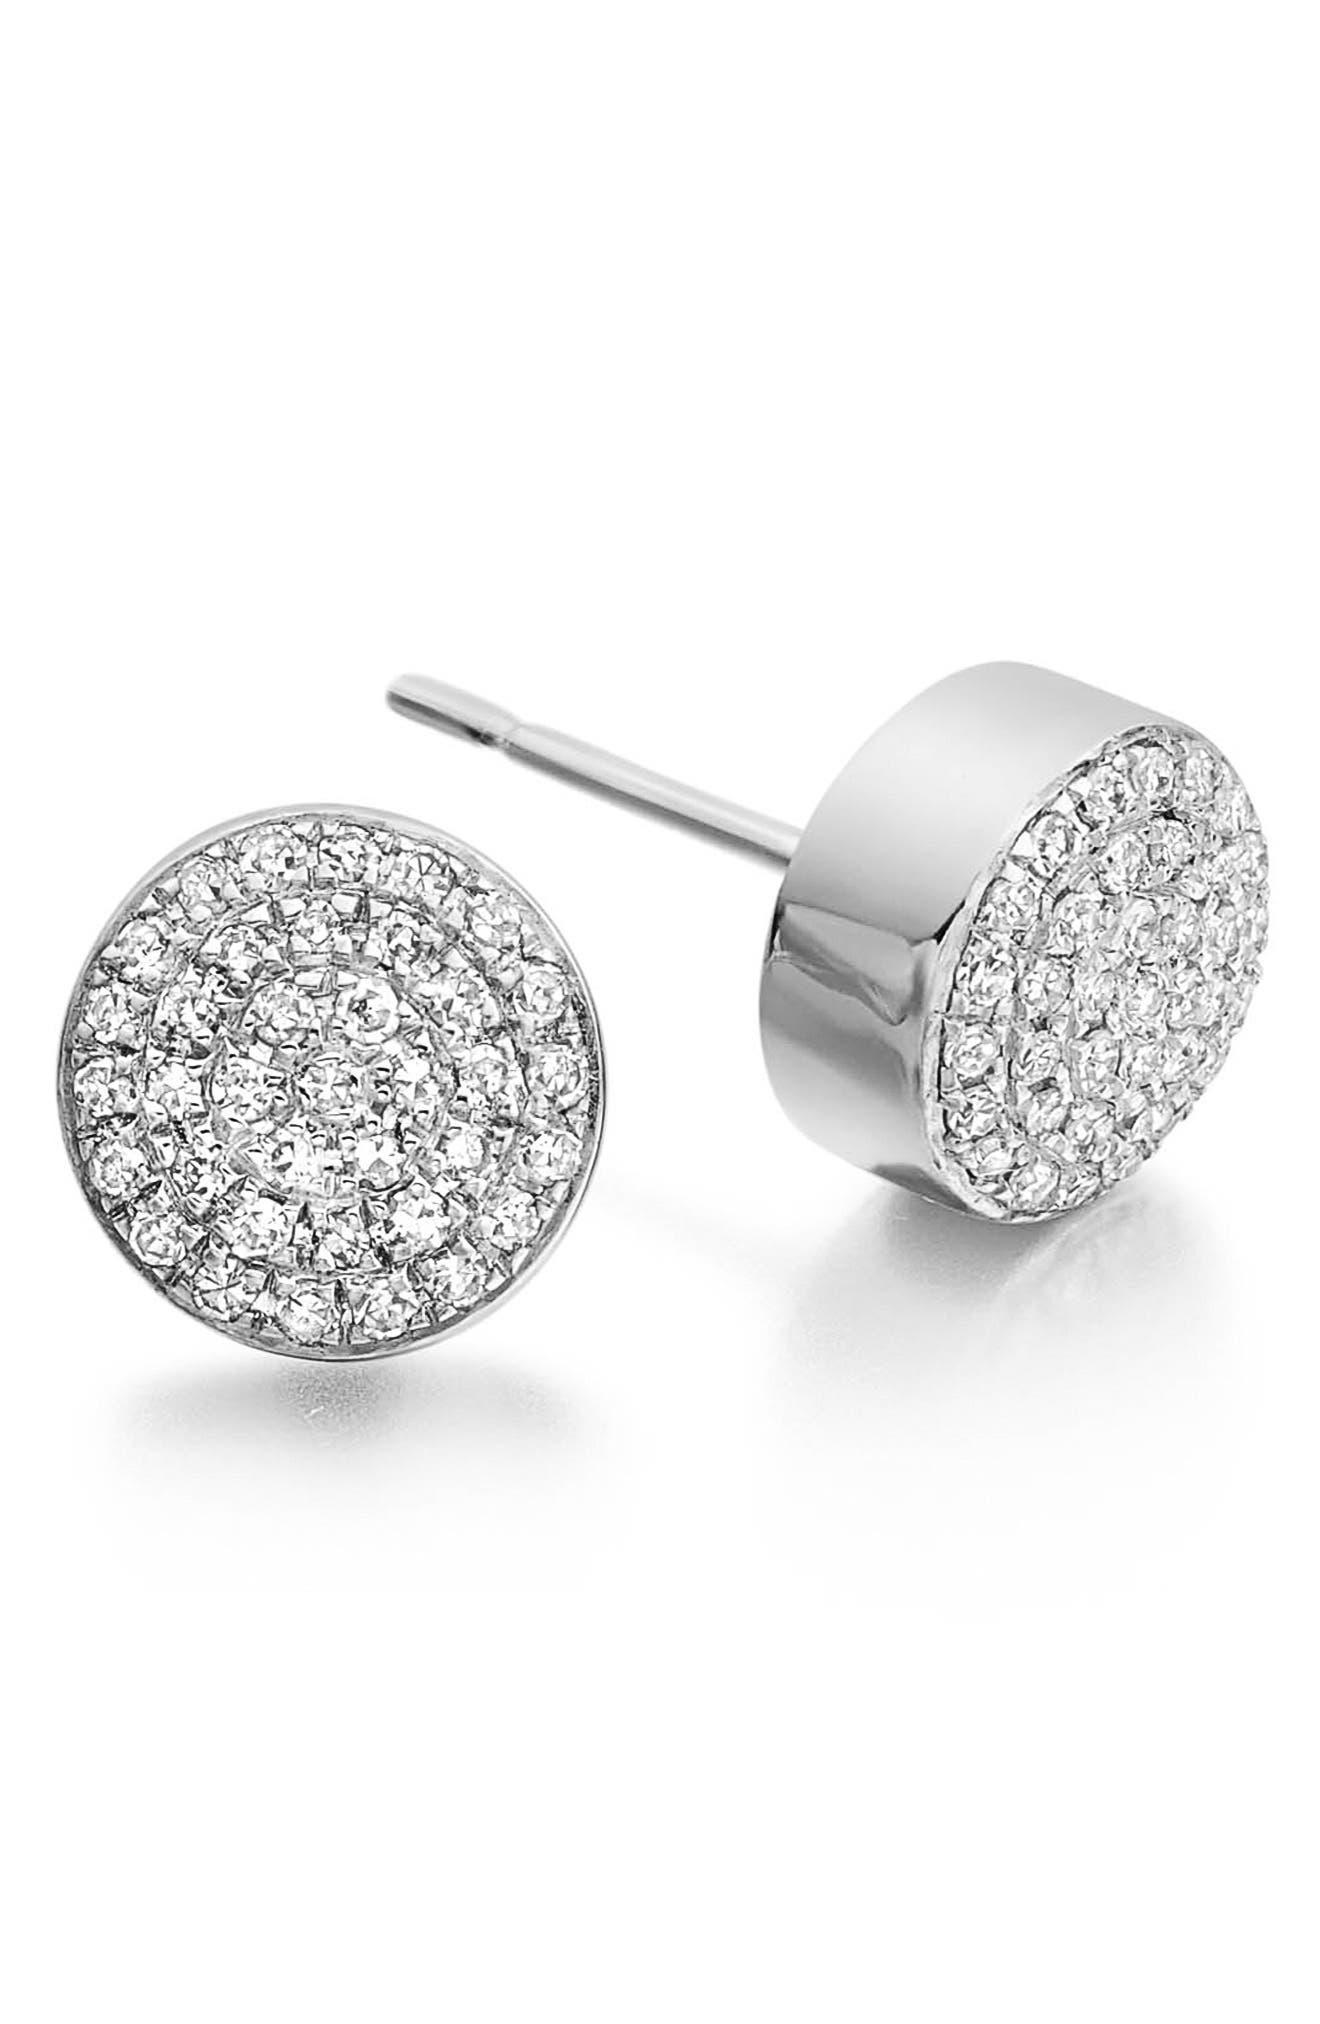 'Ava' Diamond Button Stud Earrings,                             Alternate thumbnail 2, color,                             SILVER